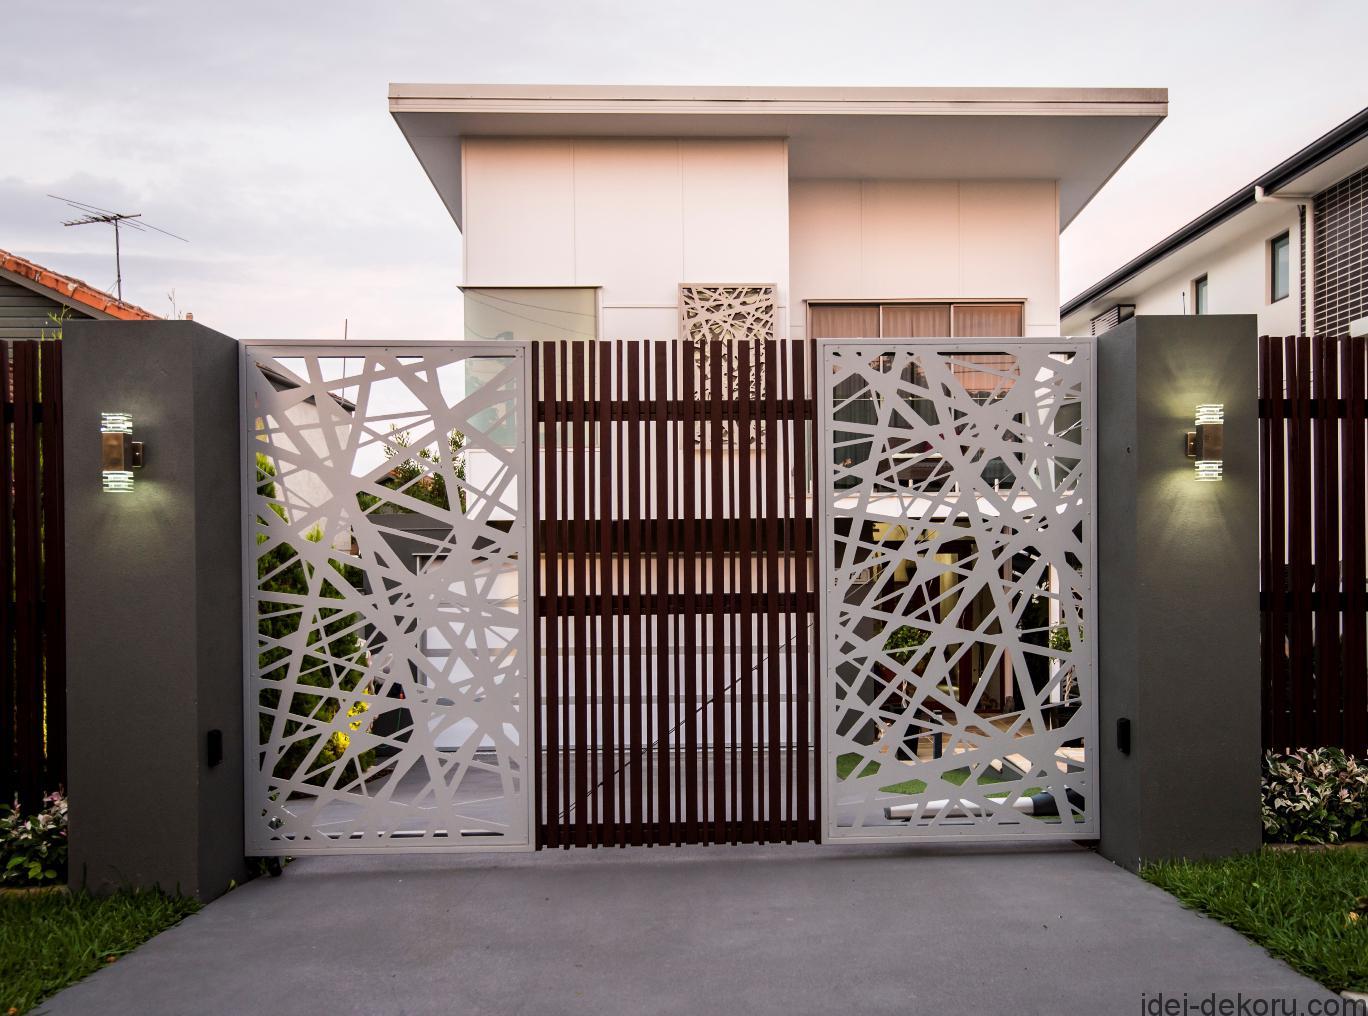 modern-architectural-new-home-brisbane-screened-driveway-gate-metal-designer-lighting-entrance